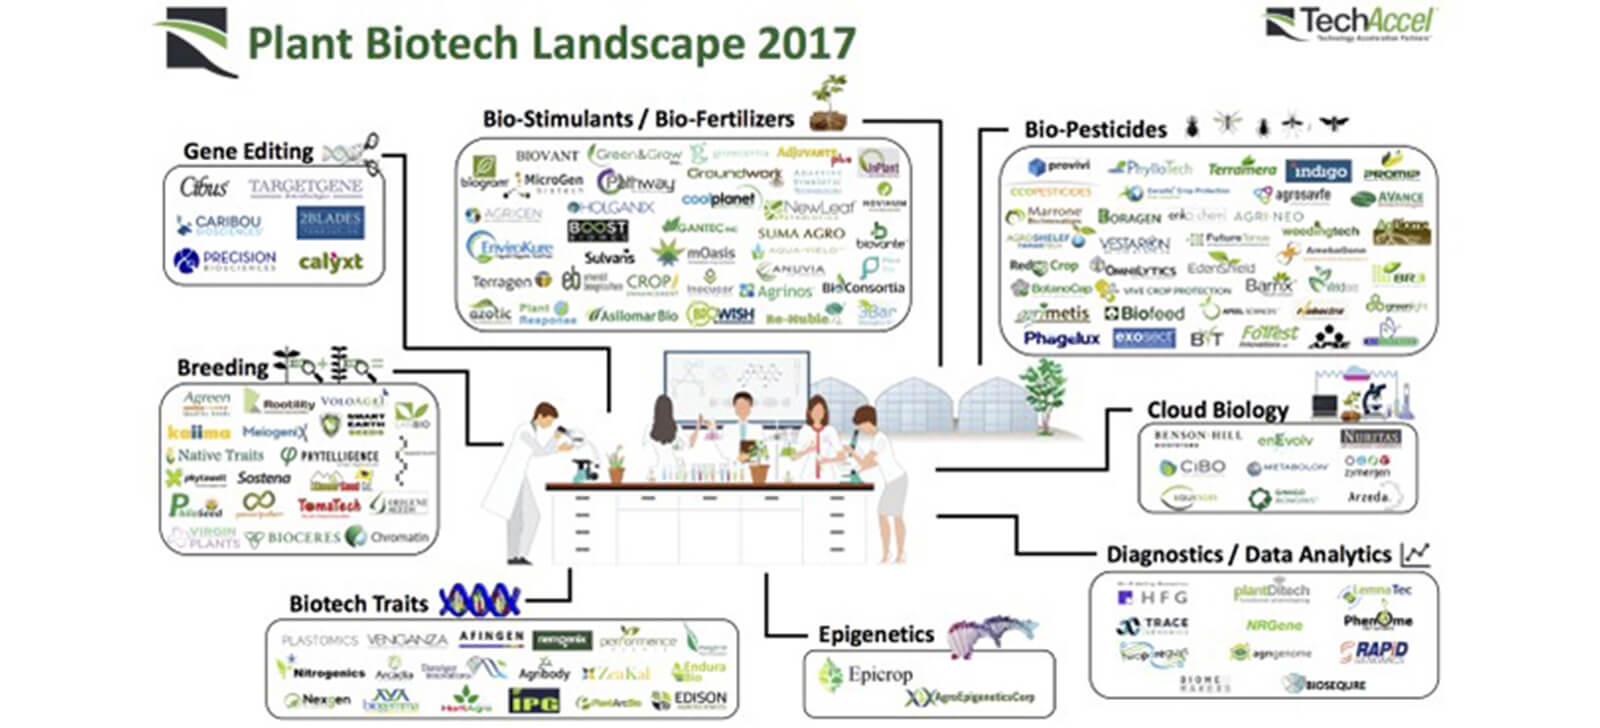 promip manejo integrado de pragas controle biologico promip participa relacao startups destaque area biotecnologia agricola no mundo